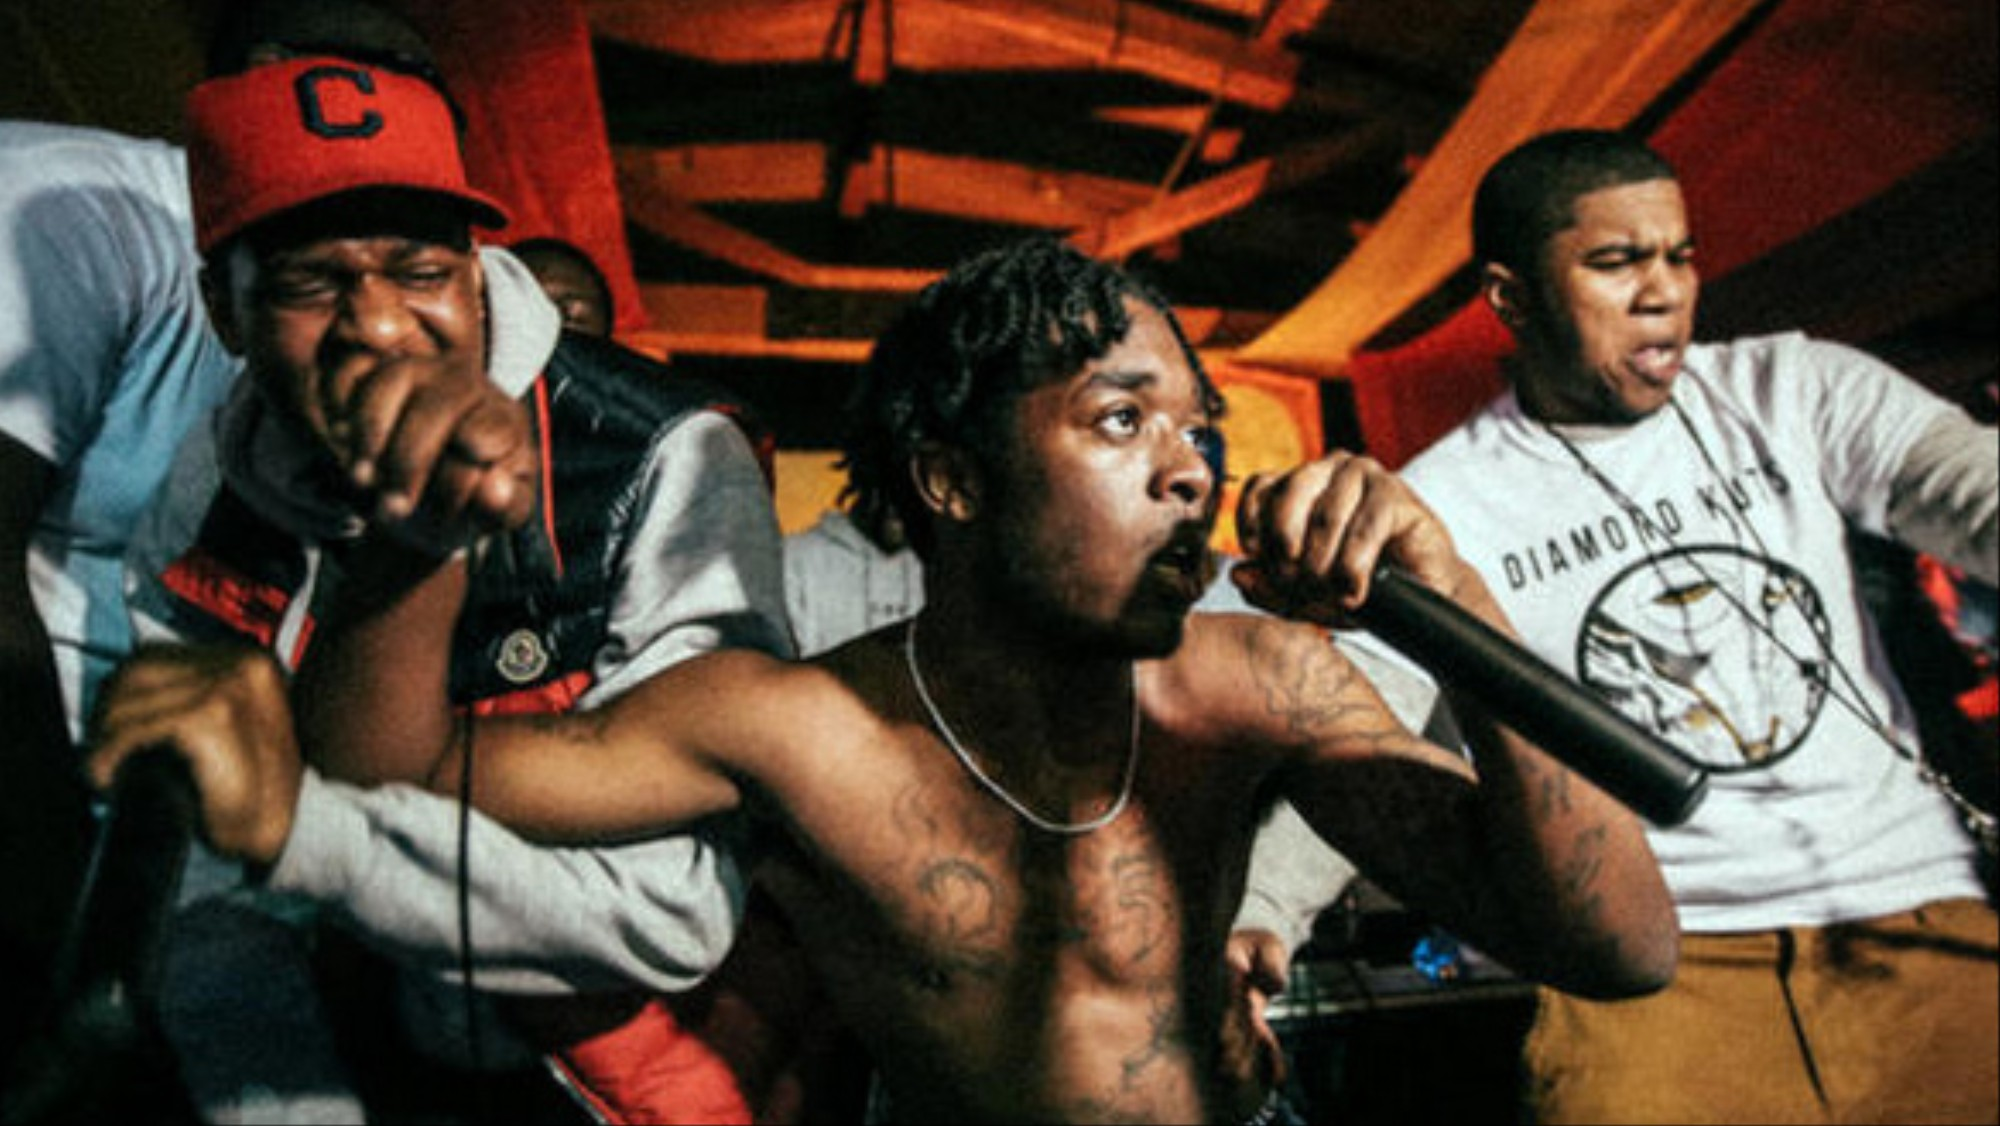 No Silver Spoon: Philadelphia's Unforgiving New Wave of Rap